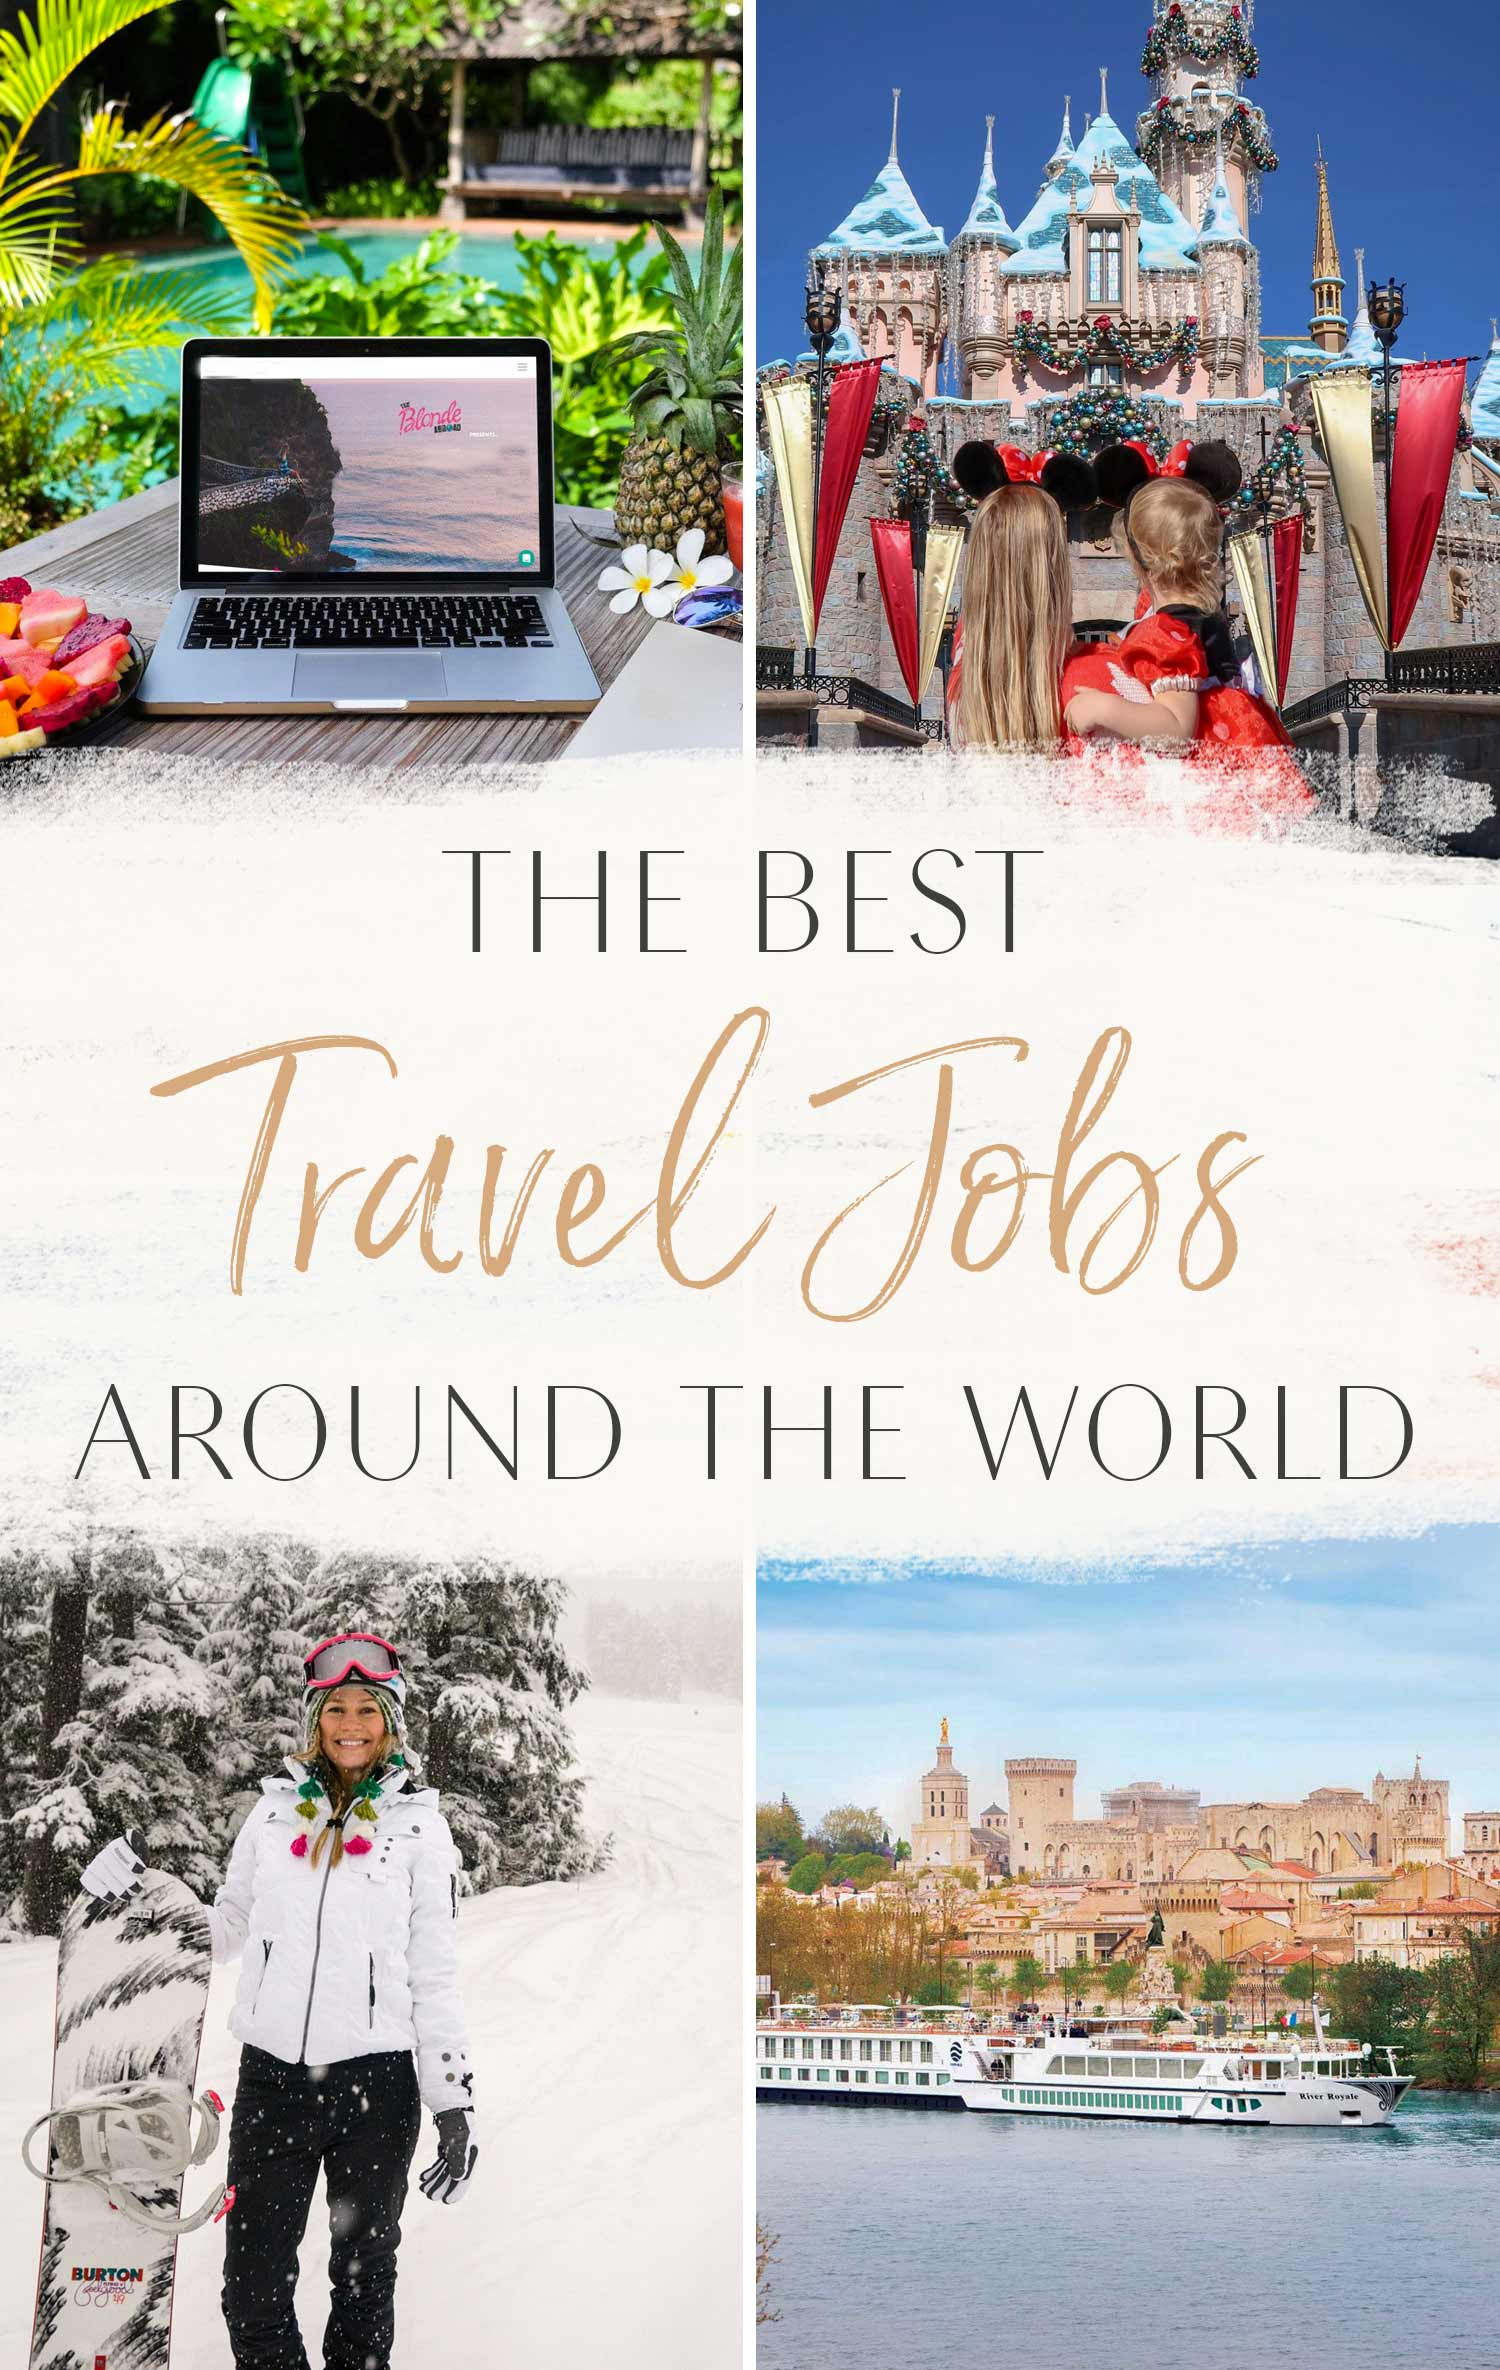 the best travel jobs around the world